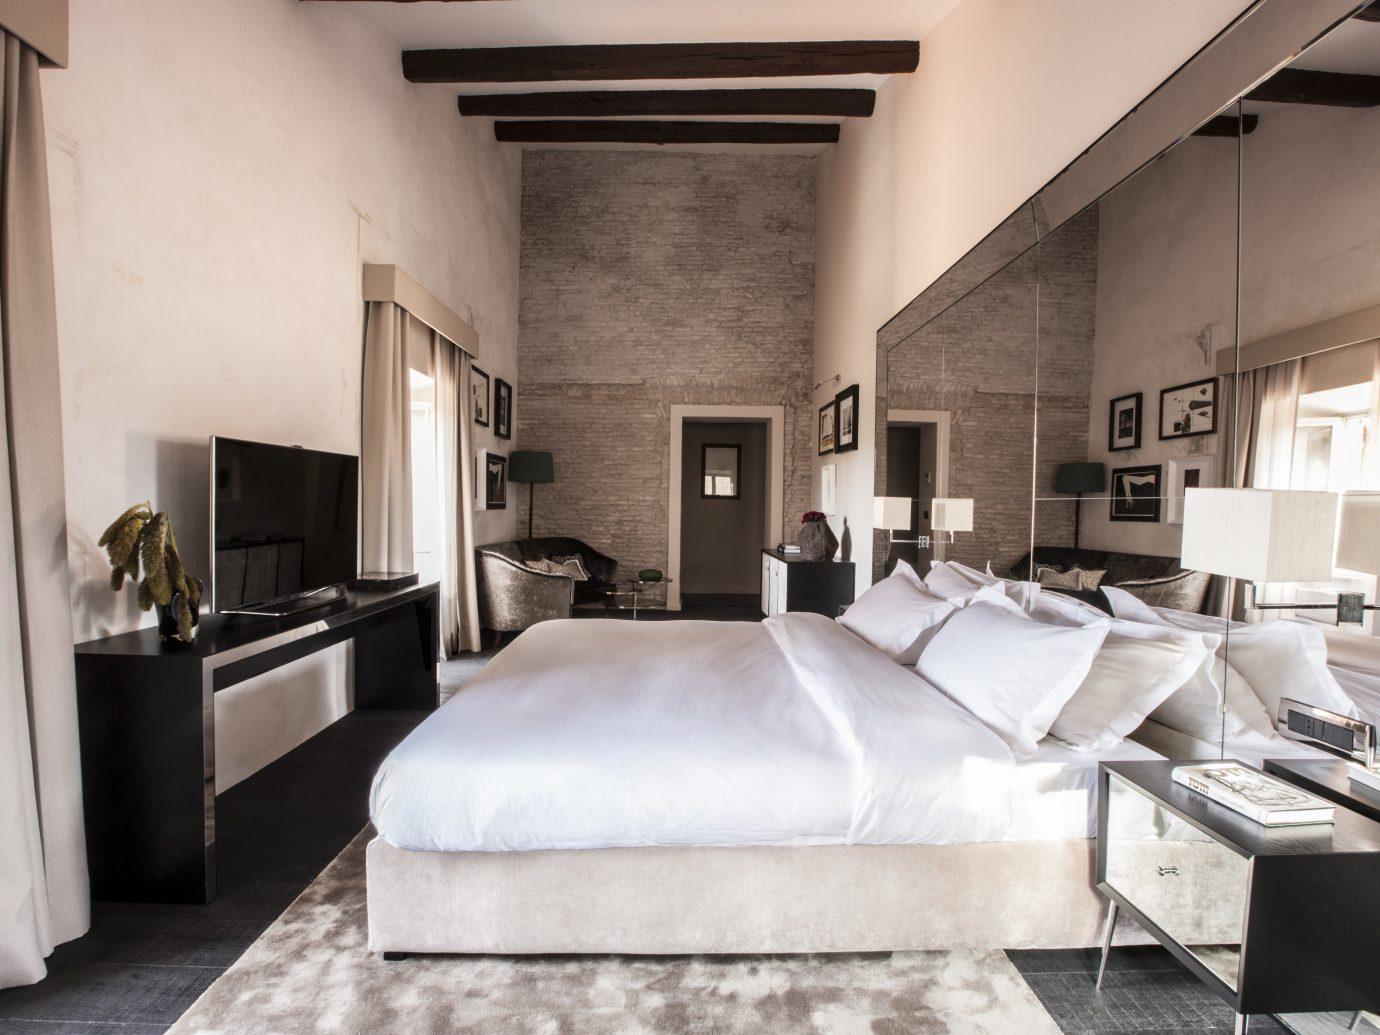 Boutique Hotels Hotels indoor wall floor room interior design bed ceiling furniture bed frame Suite Bedroom interior designer loft flooring